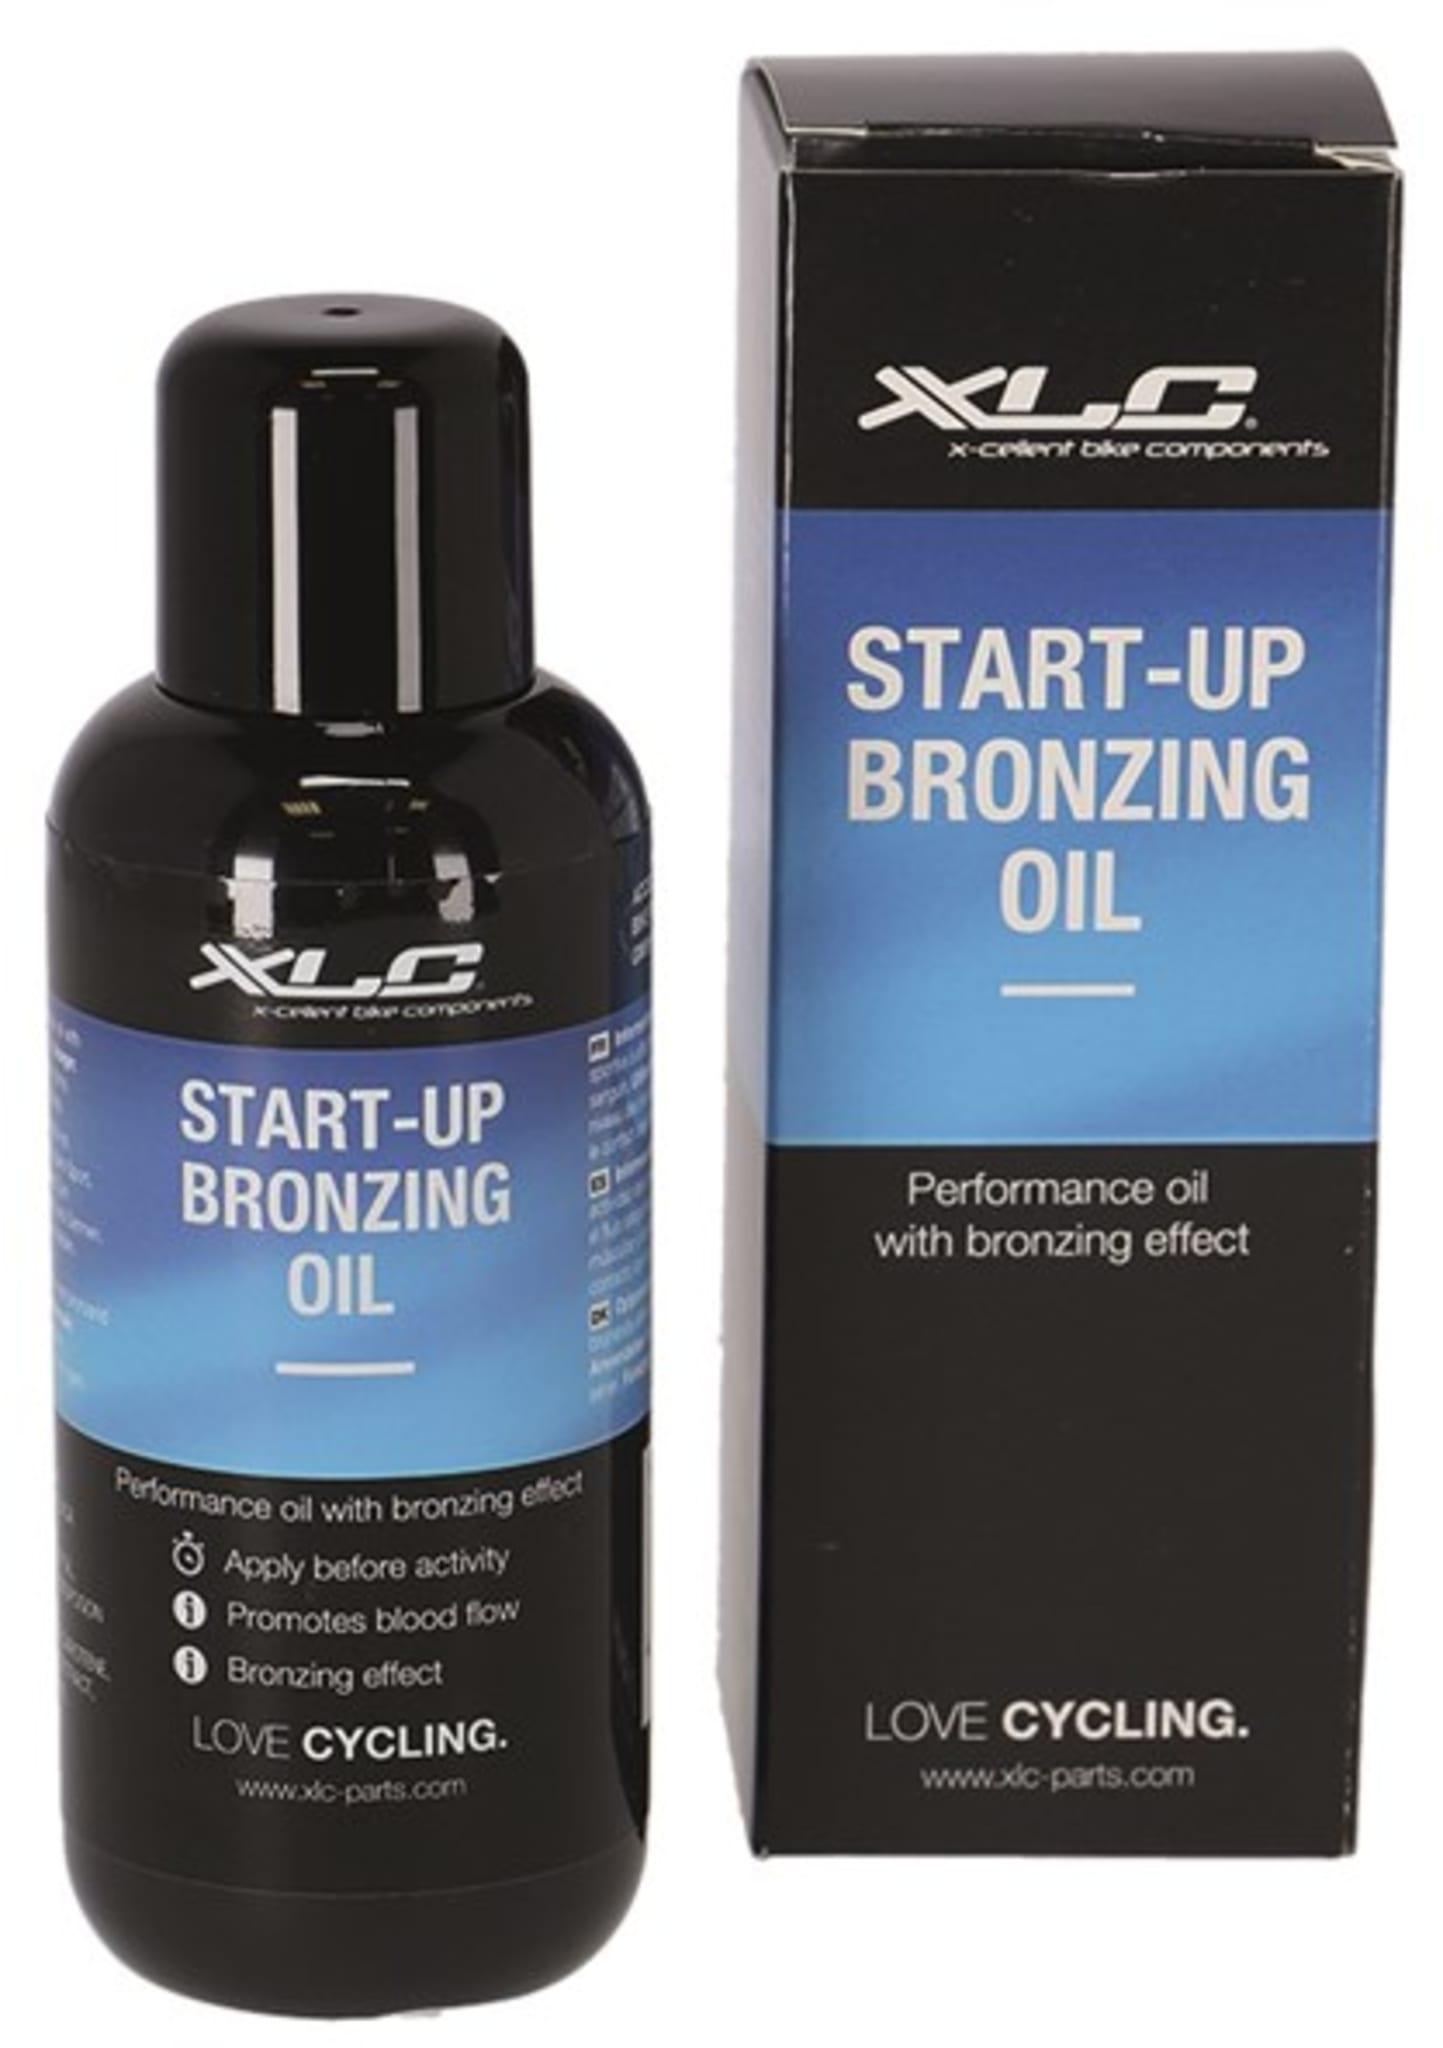 Start-Up Bronzing Oil